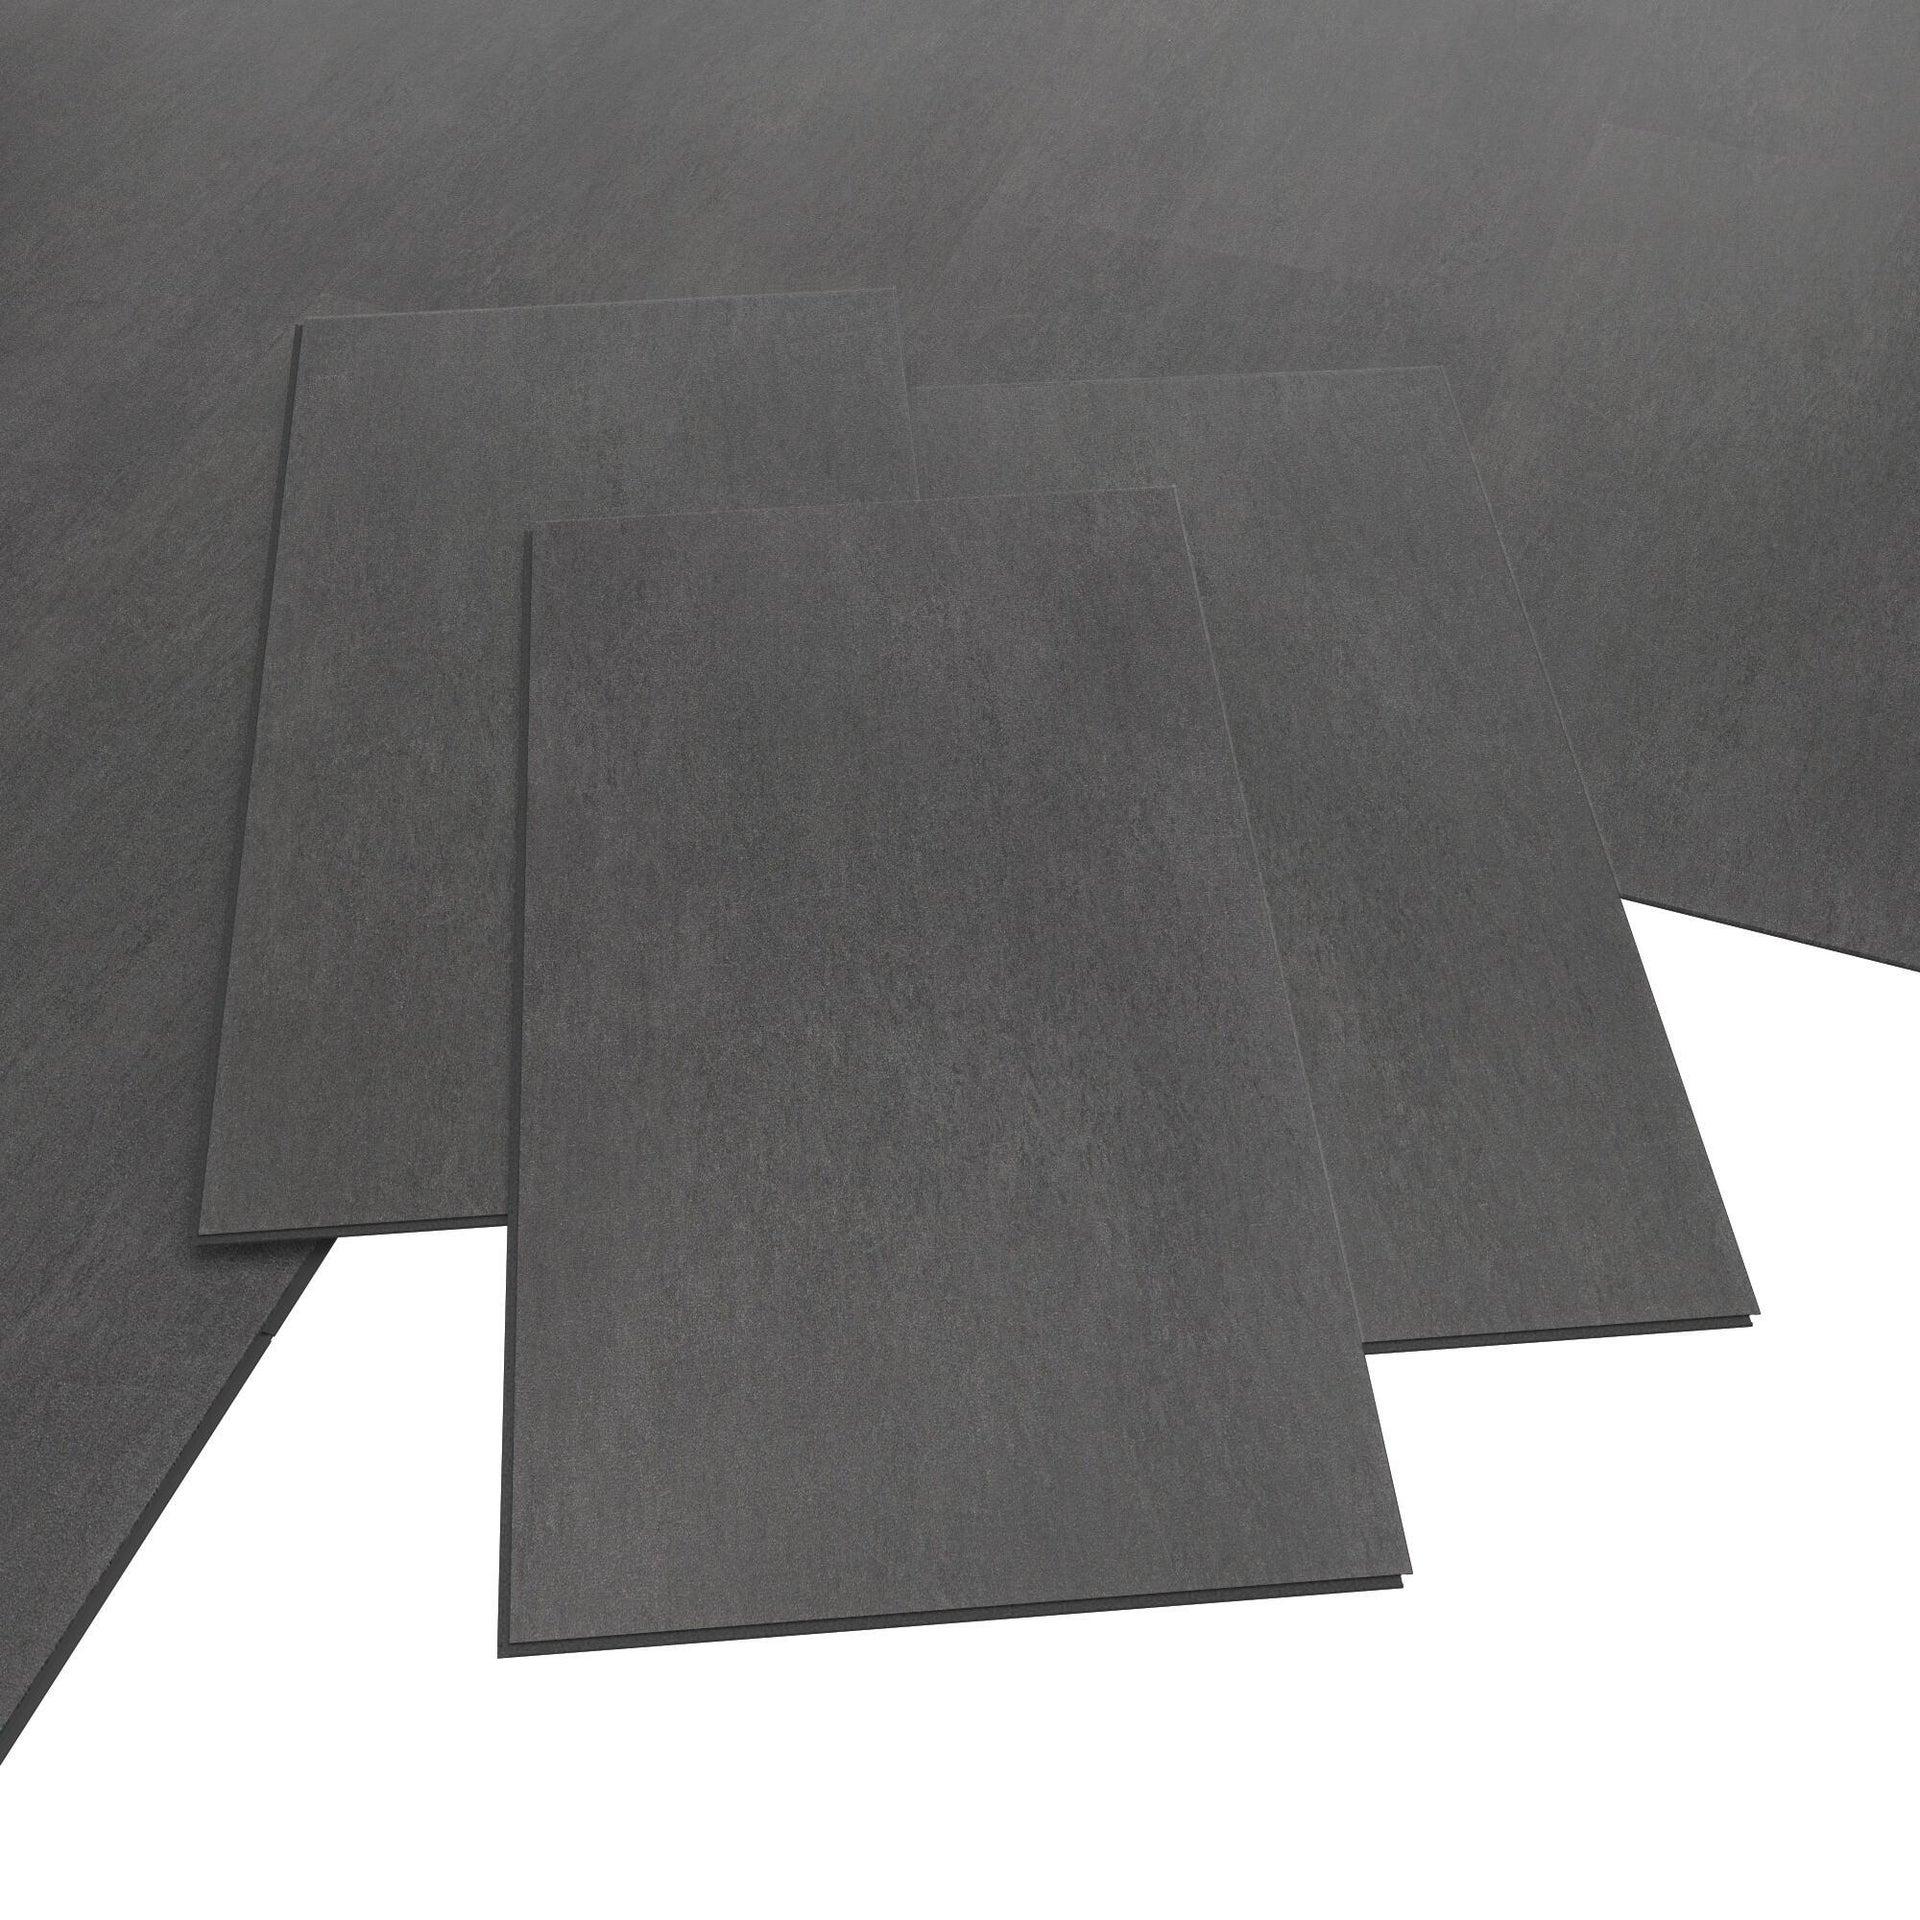 Pavimento PVC flottante clic+ Art For New Sp 4.2 mm nero - 8